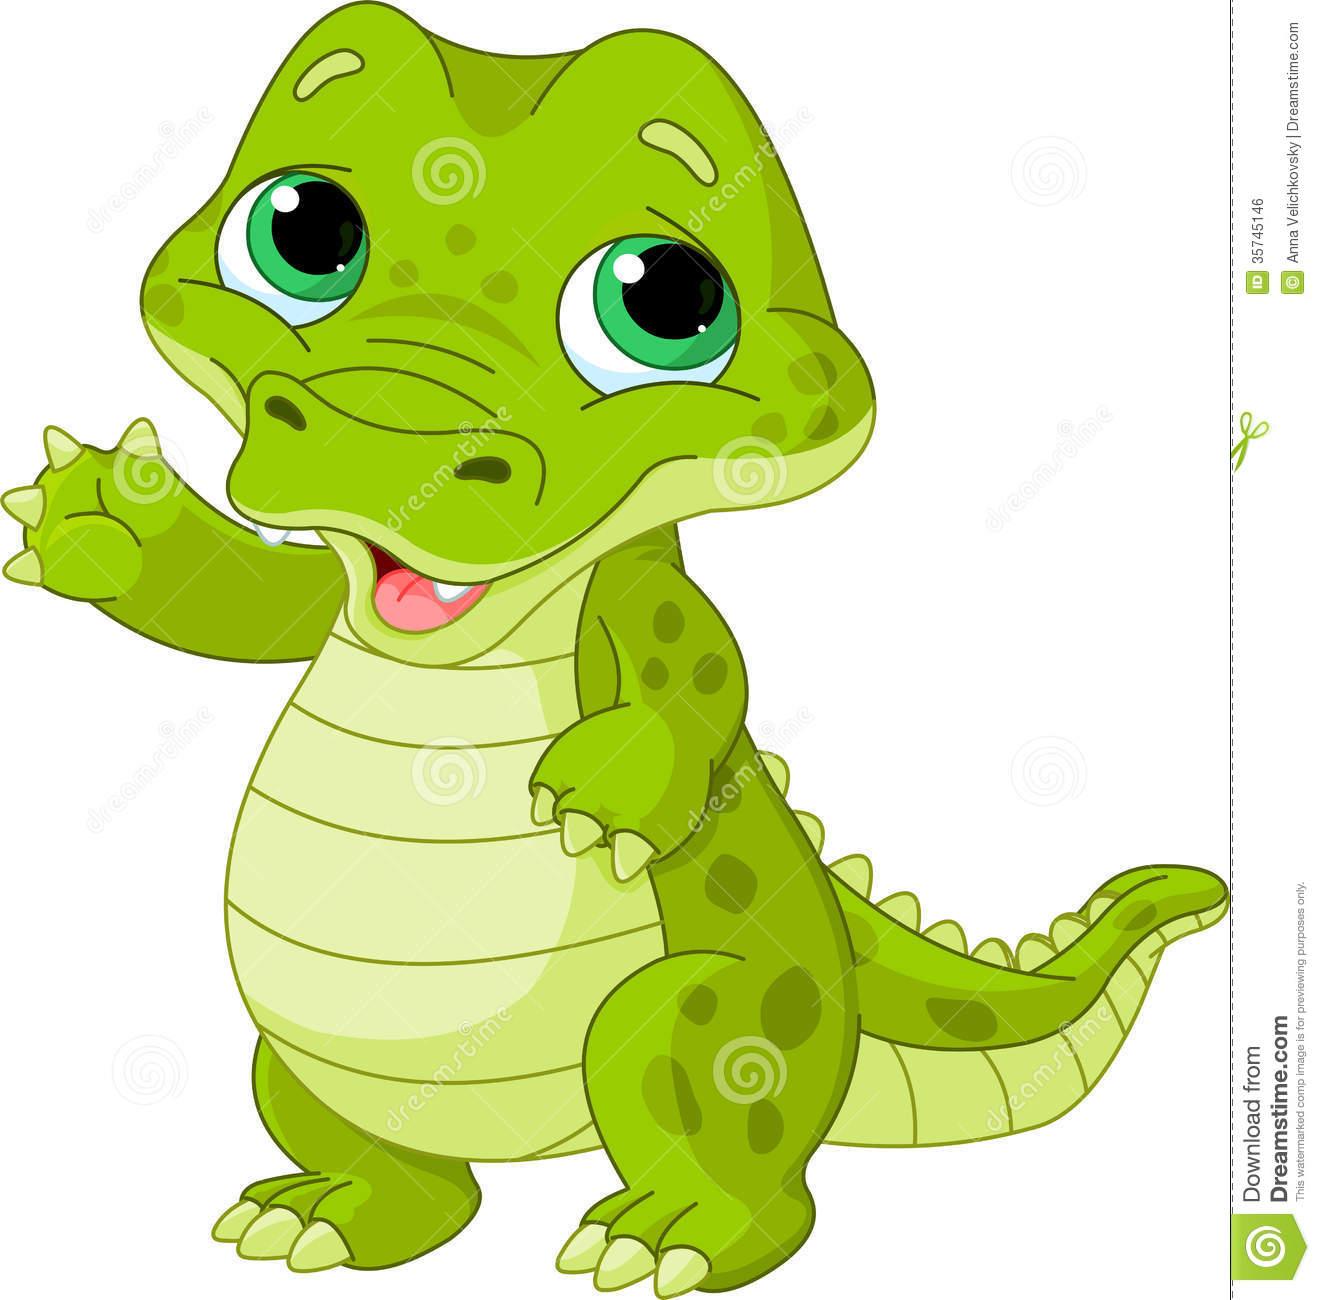 Cute alligator clipart 5 » Clipart Station.